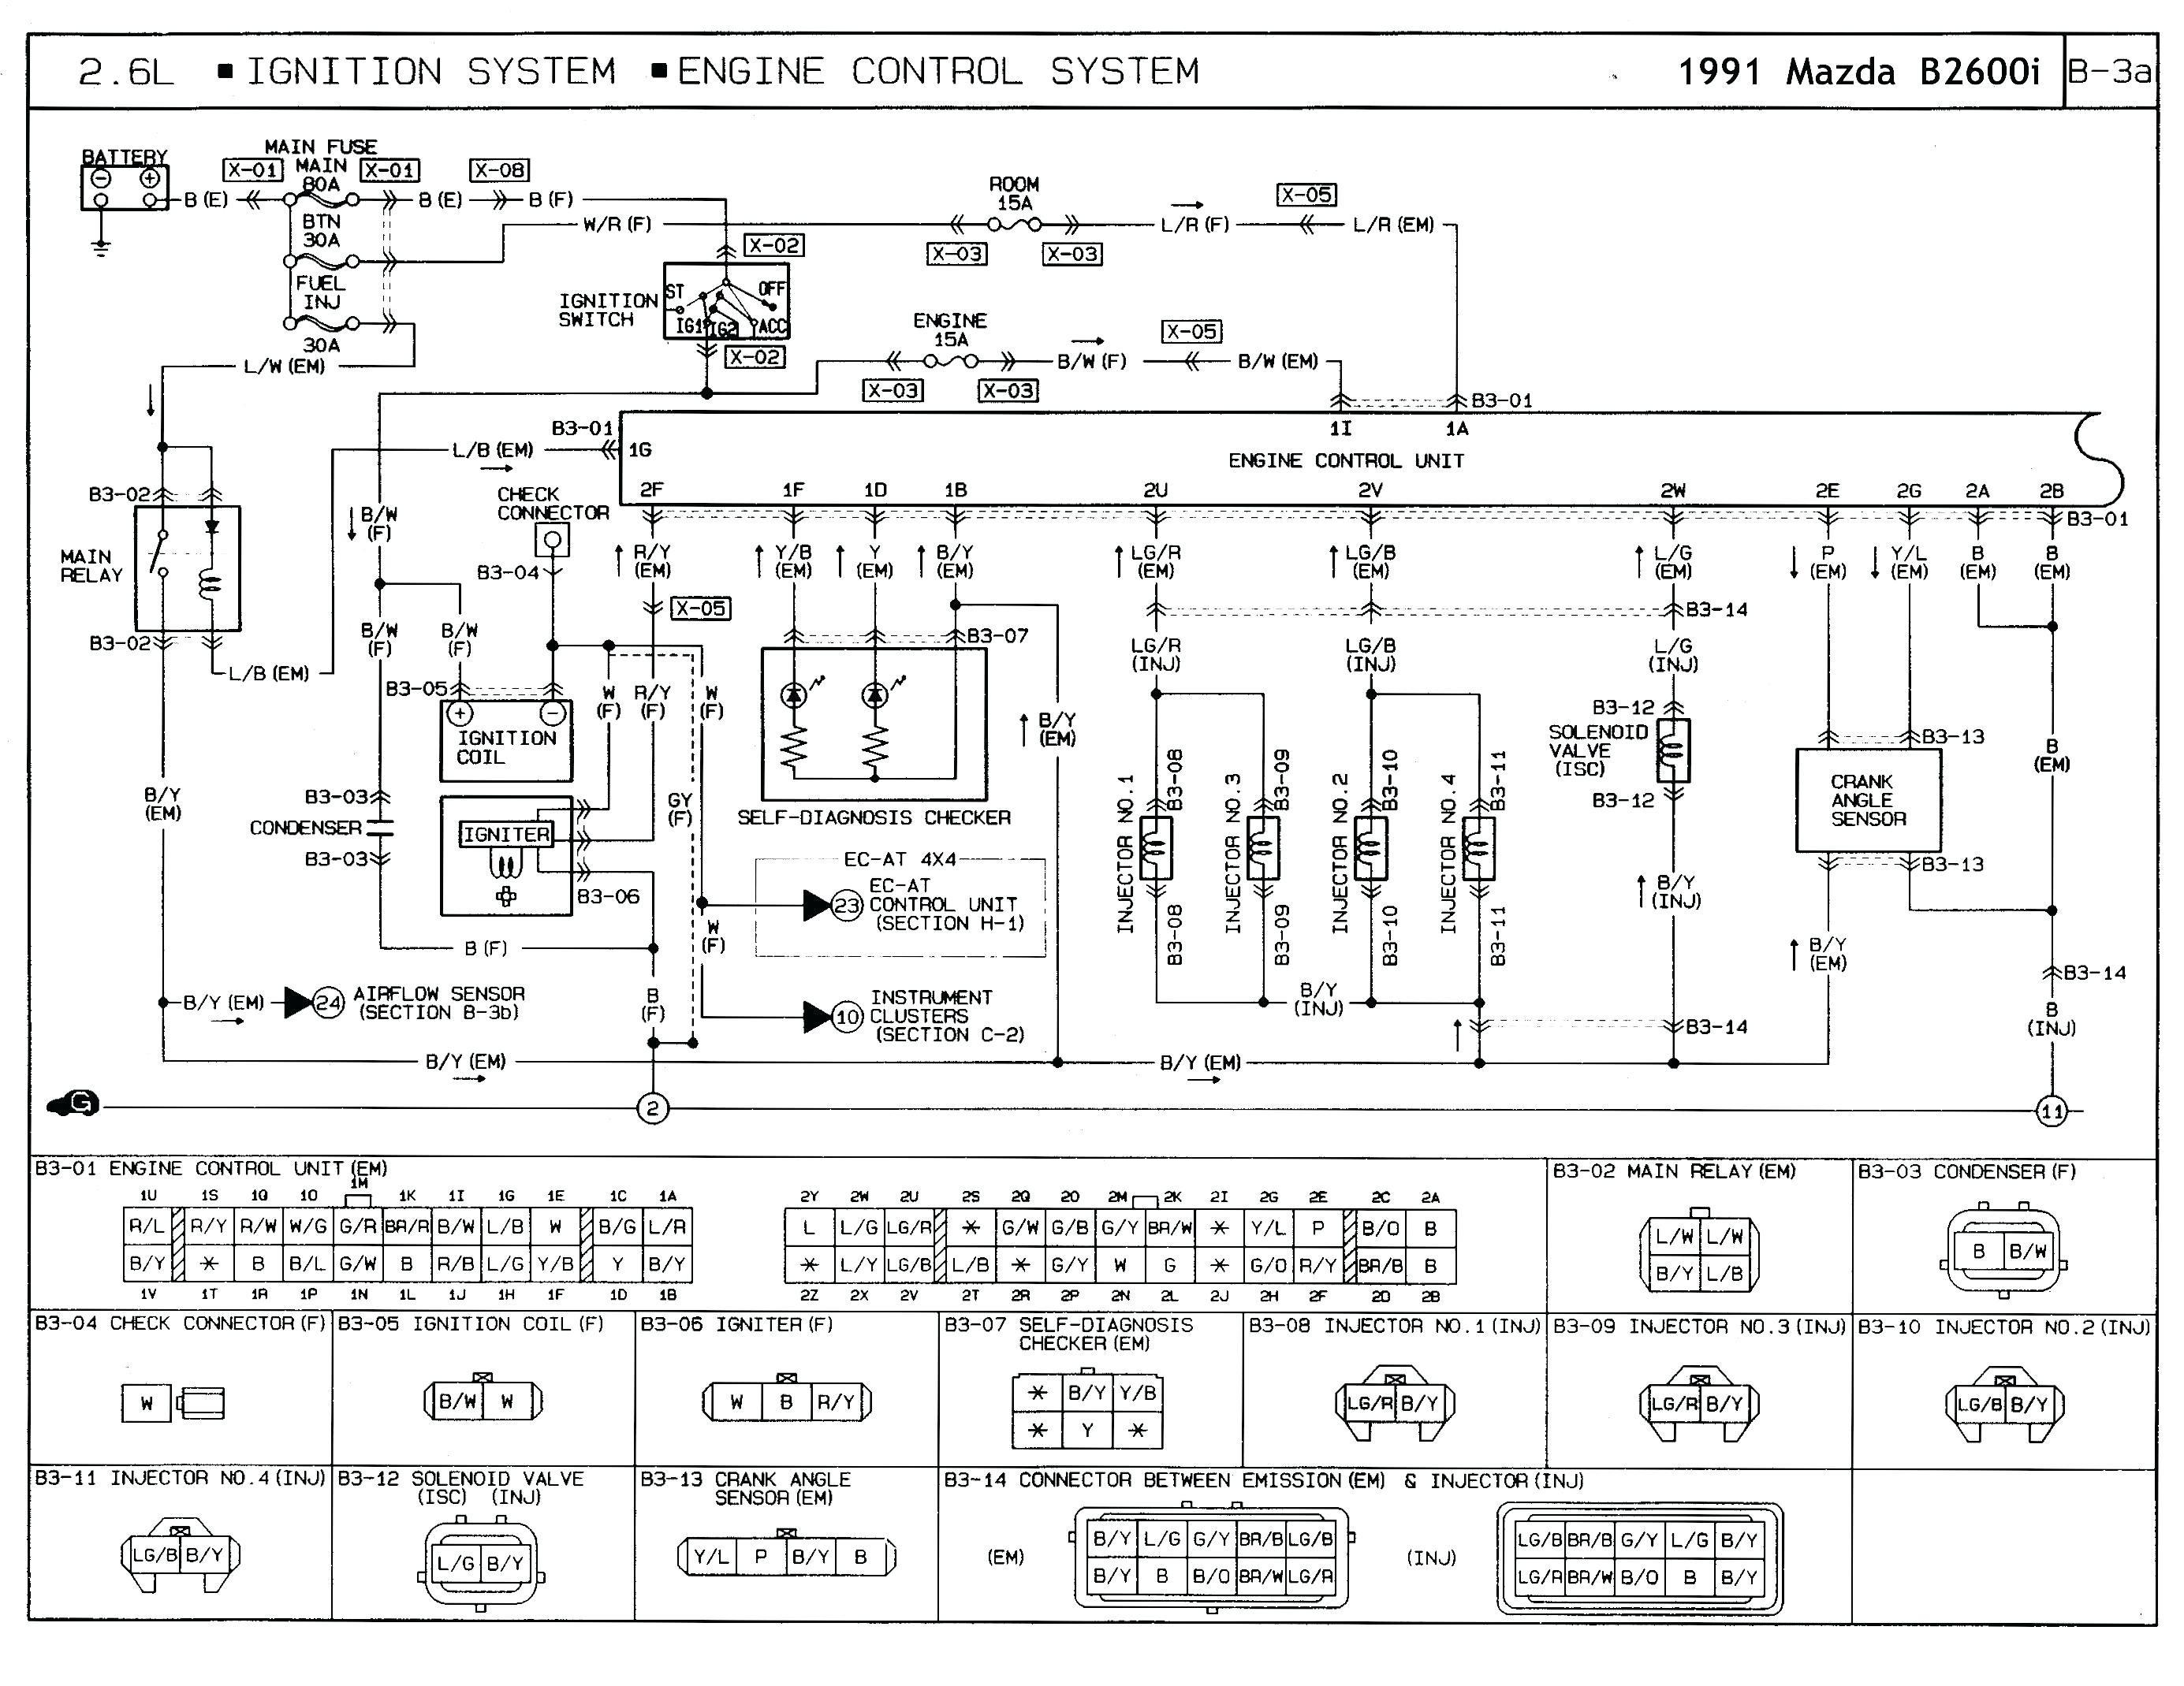 Detroit Series 60 Ecm Wiring Diagram Ecm Wiring Diagram Wiring Diagrams Of Detroit Series 60 Ecm Wiring Diagram